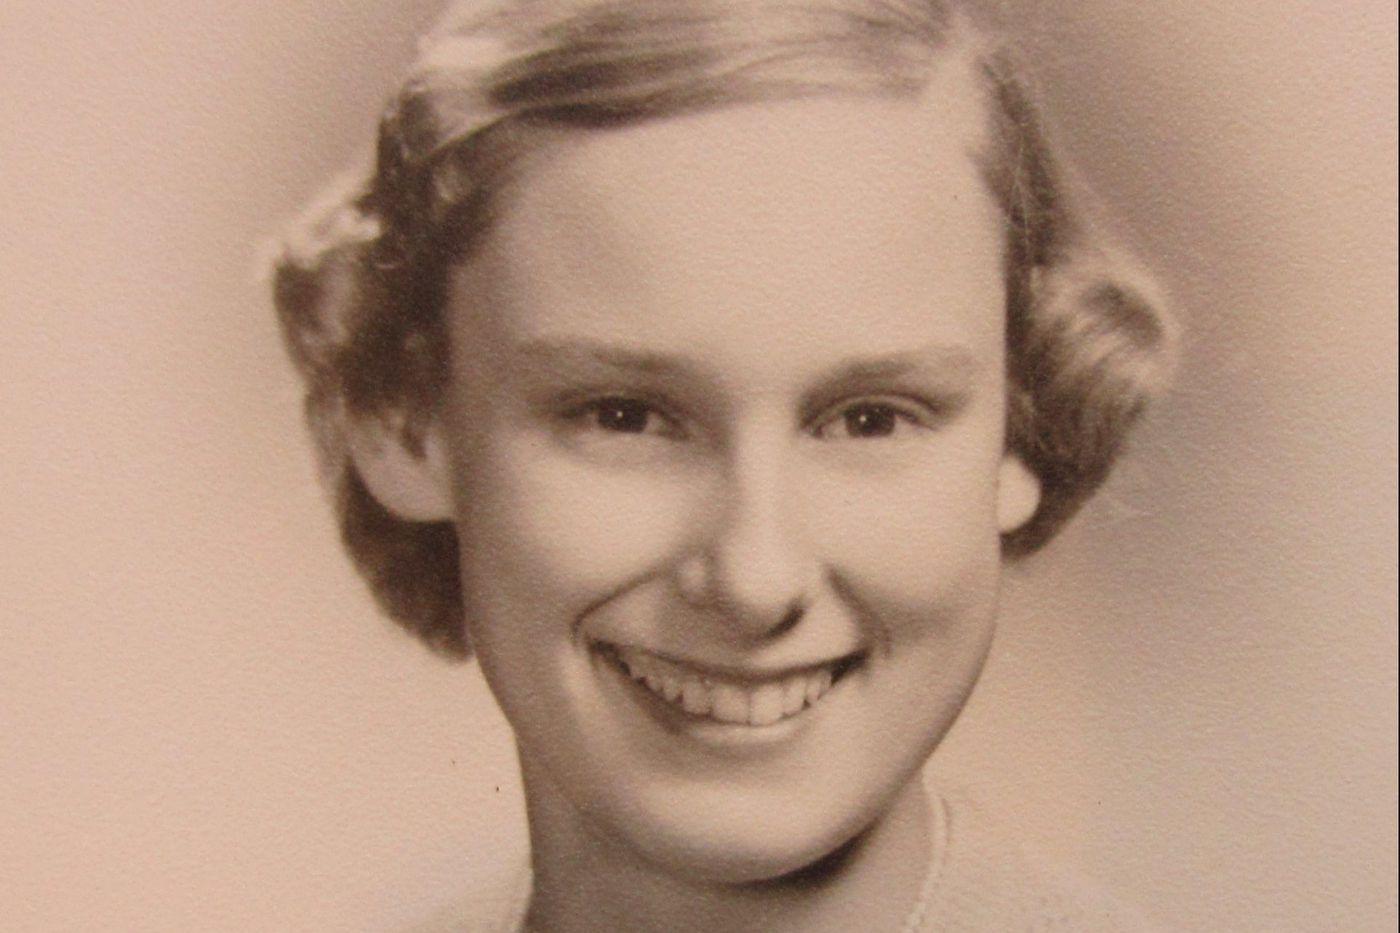 Ingrid G. Daemmrich, 82, a longtime English professor at Drexel University